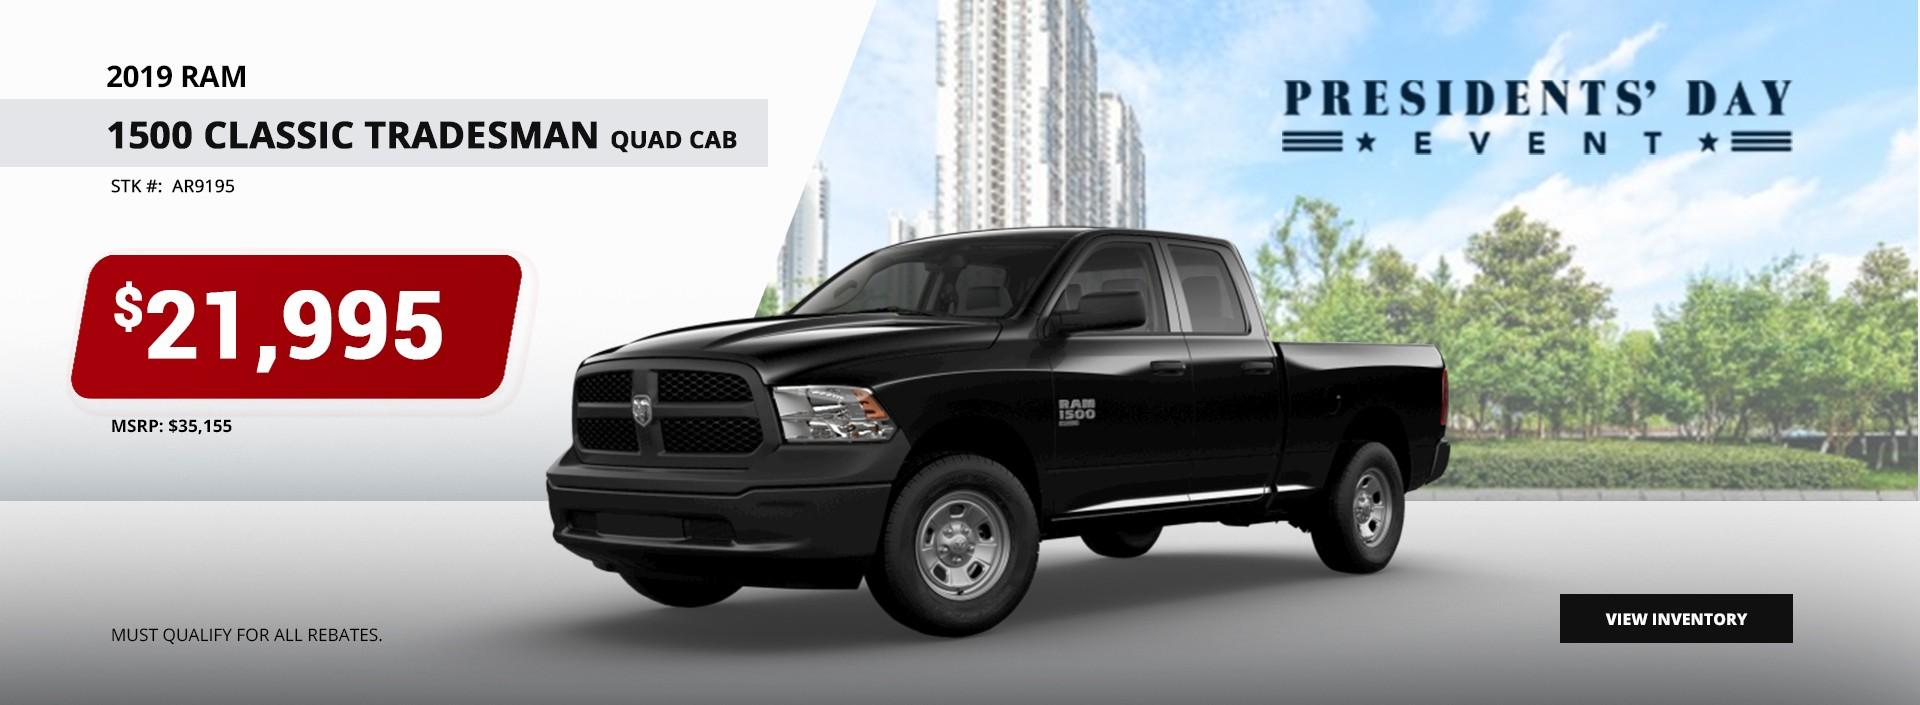 2019 Ram 1500 Classic Tradesman Quad Cab $21,995 at President's Day Sales Event